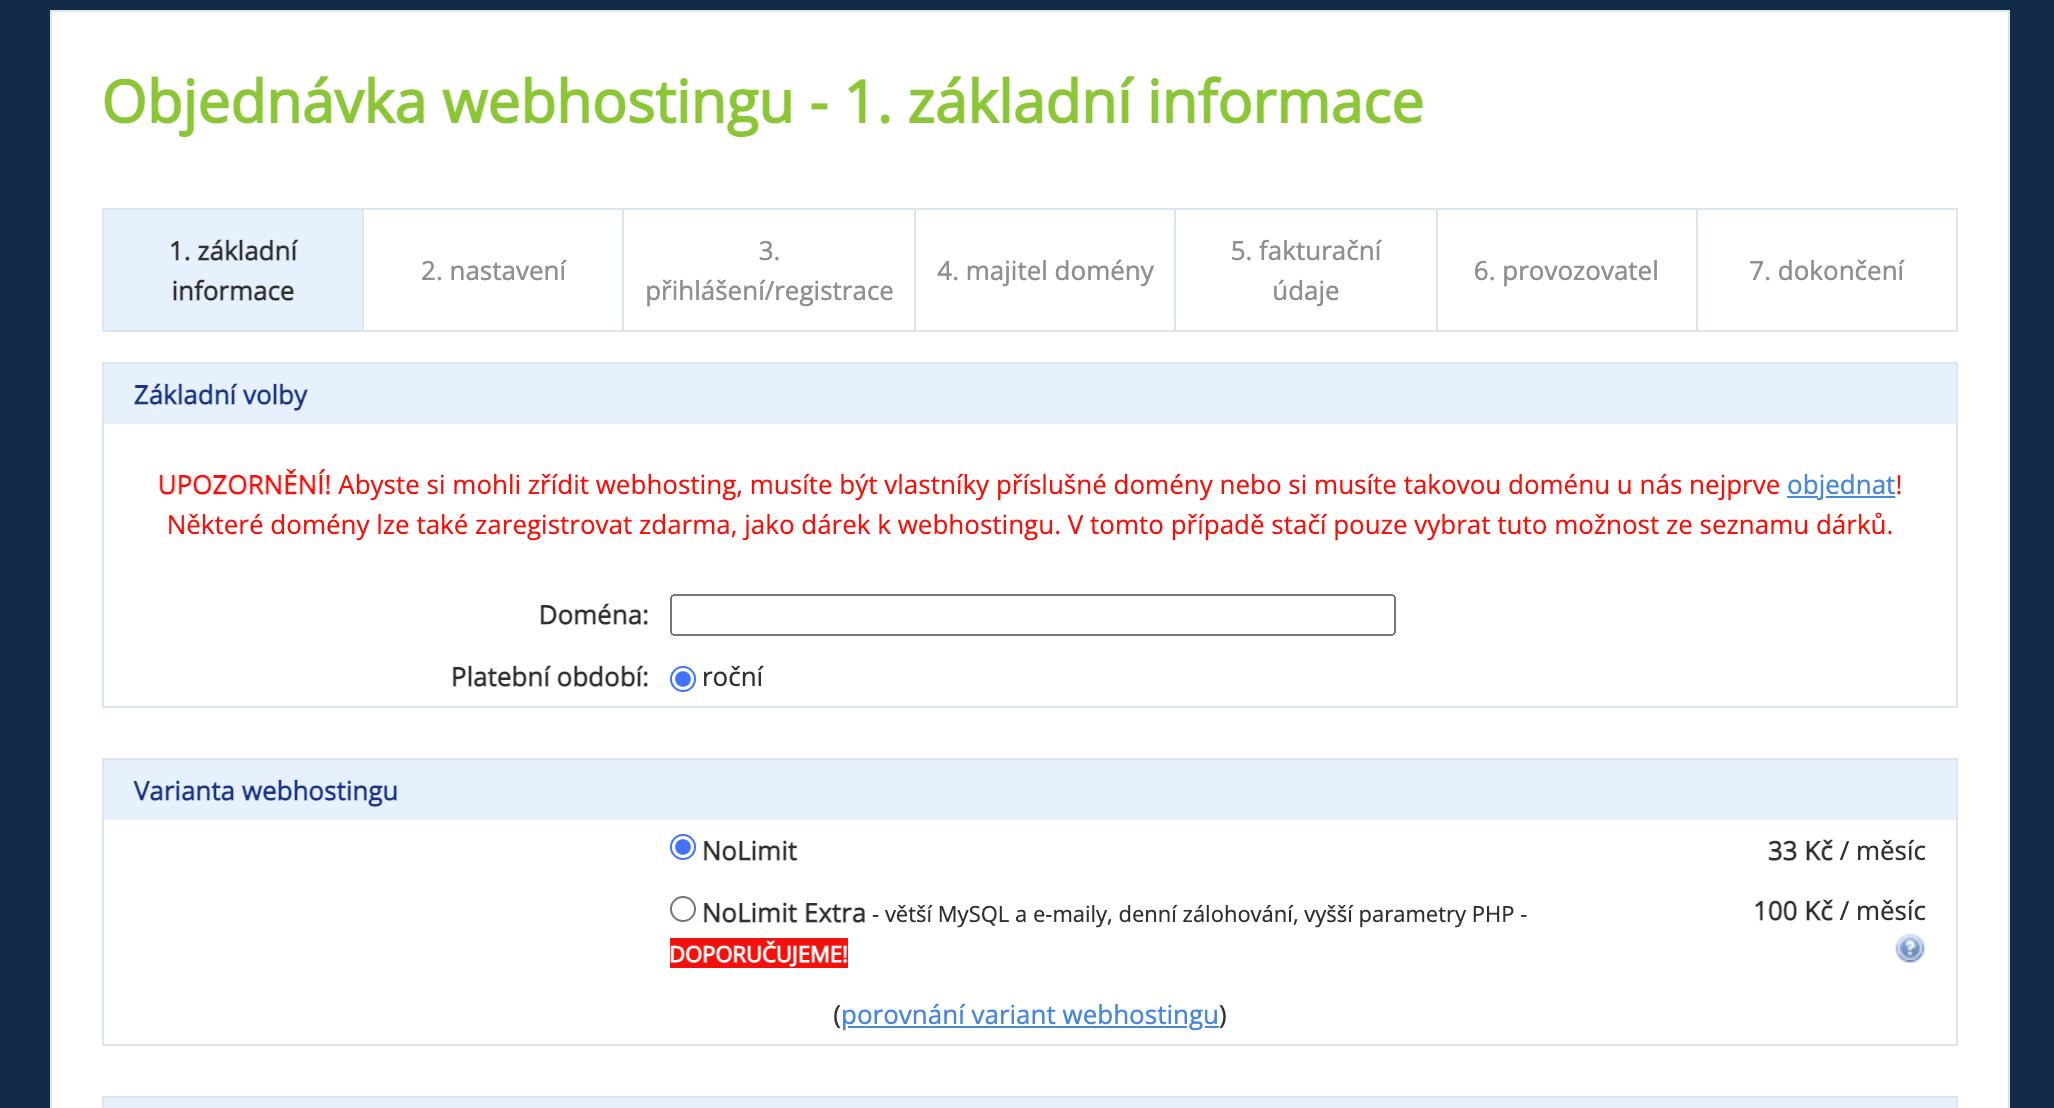 wedos hosting https